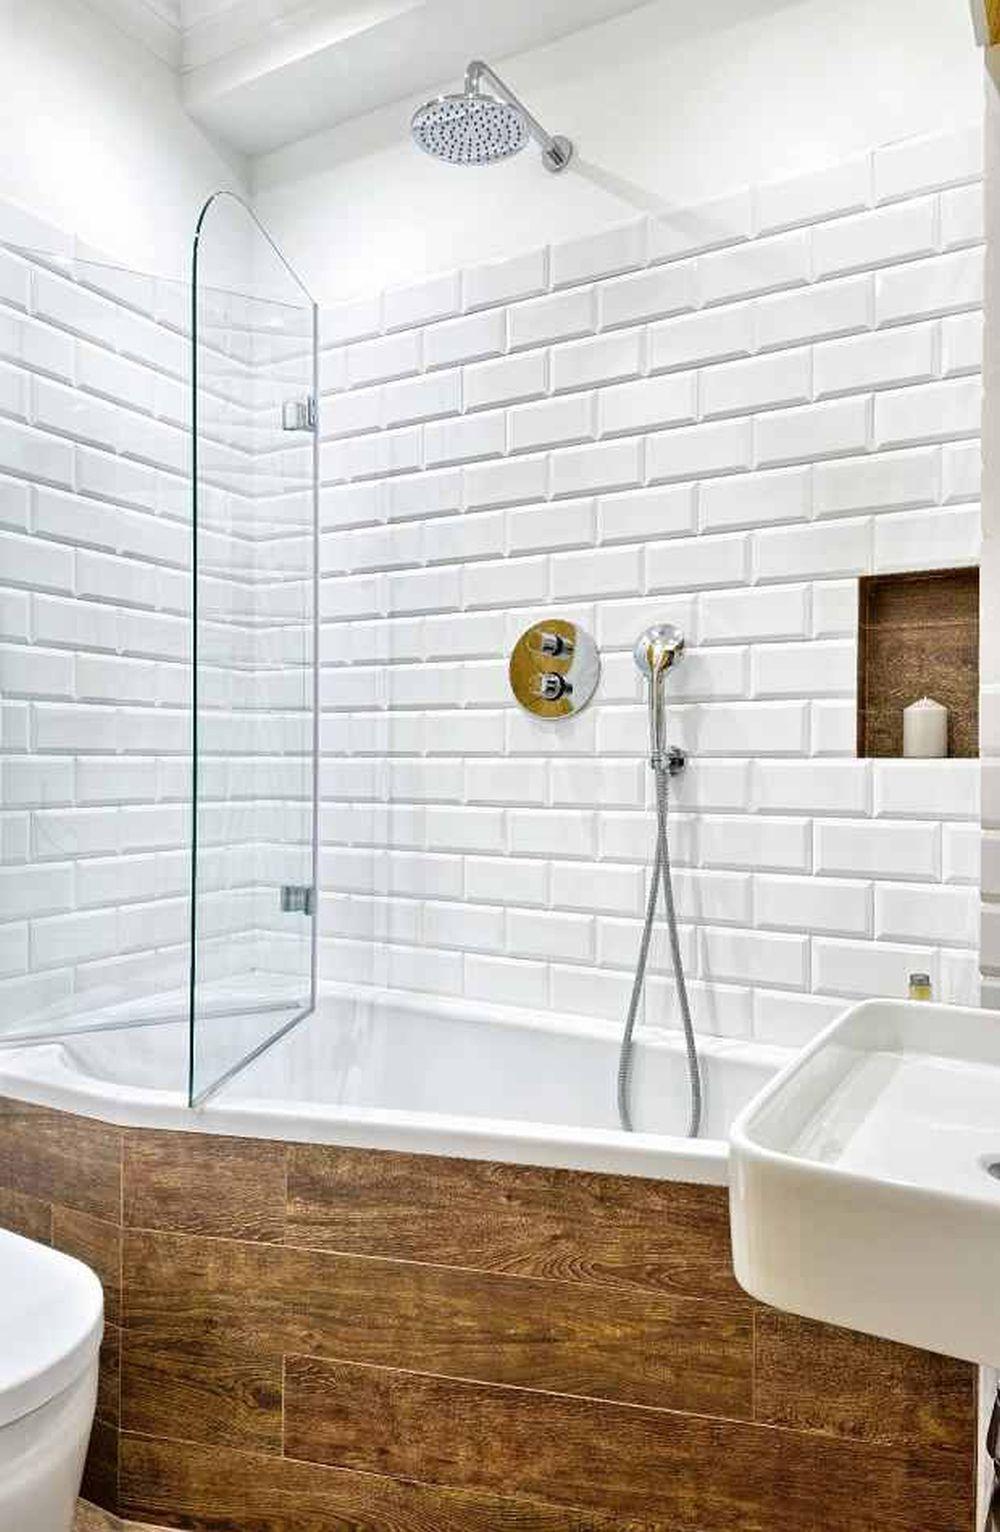 adelaparvu.com despre apartament cu accente de galben, designer Macieja Kocoja, Foto Mariusz Purta (14)